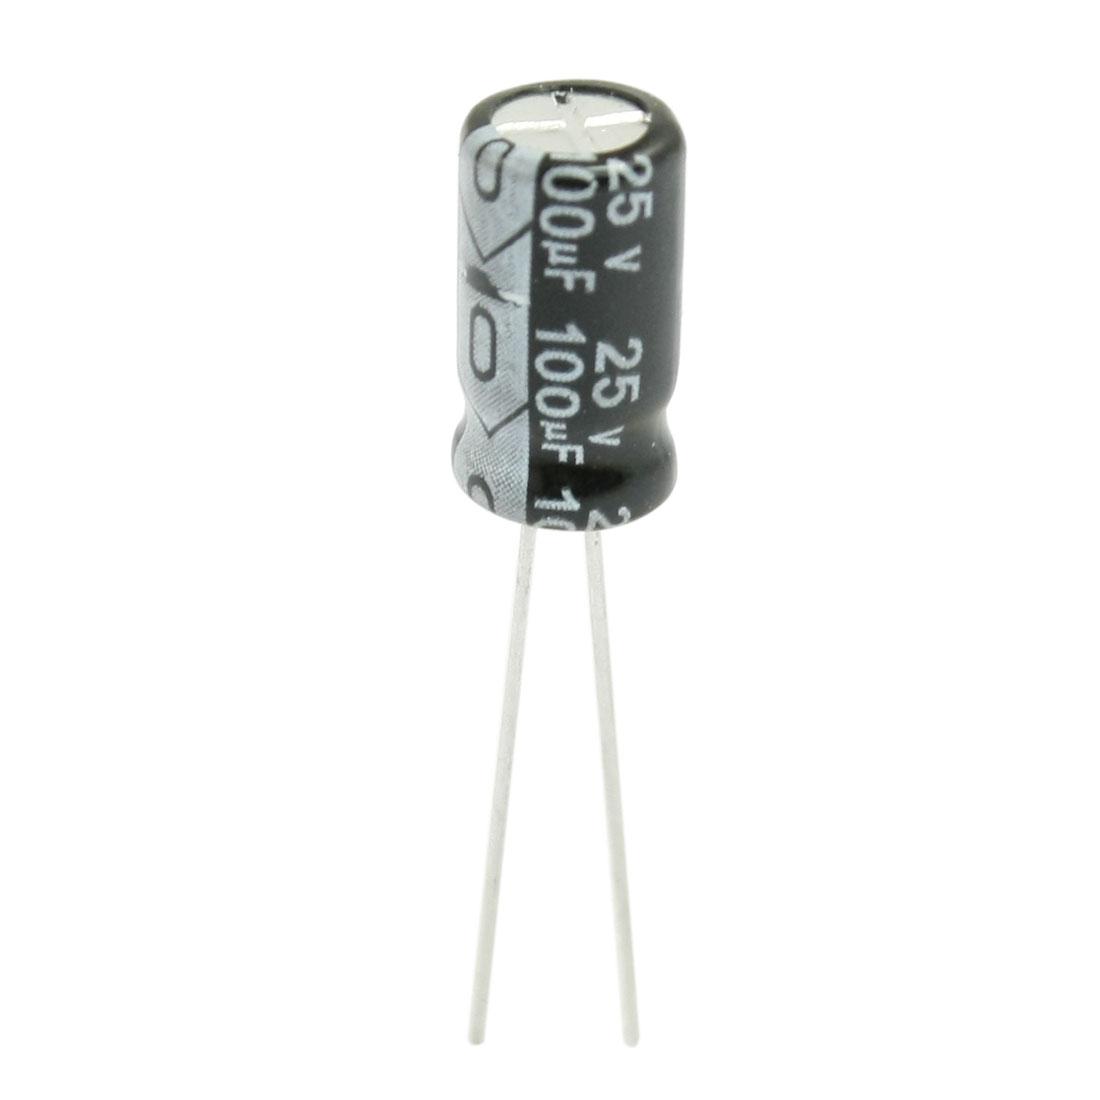 100 Pcs 100uF 25V 105C Radial Aluminum Electrolytic Capacitor